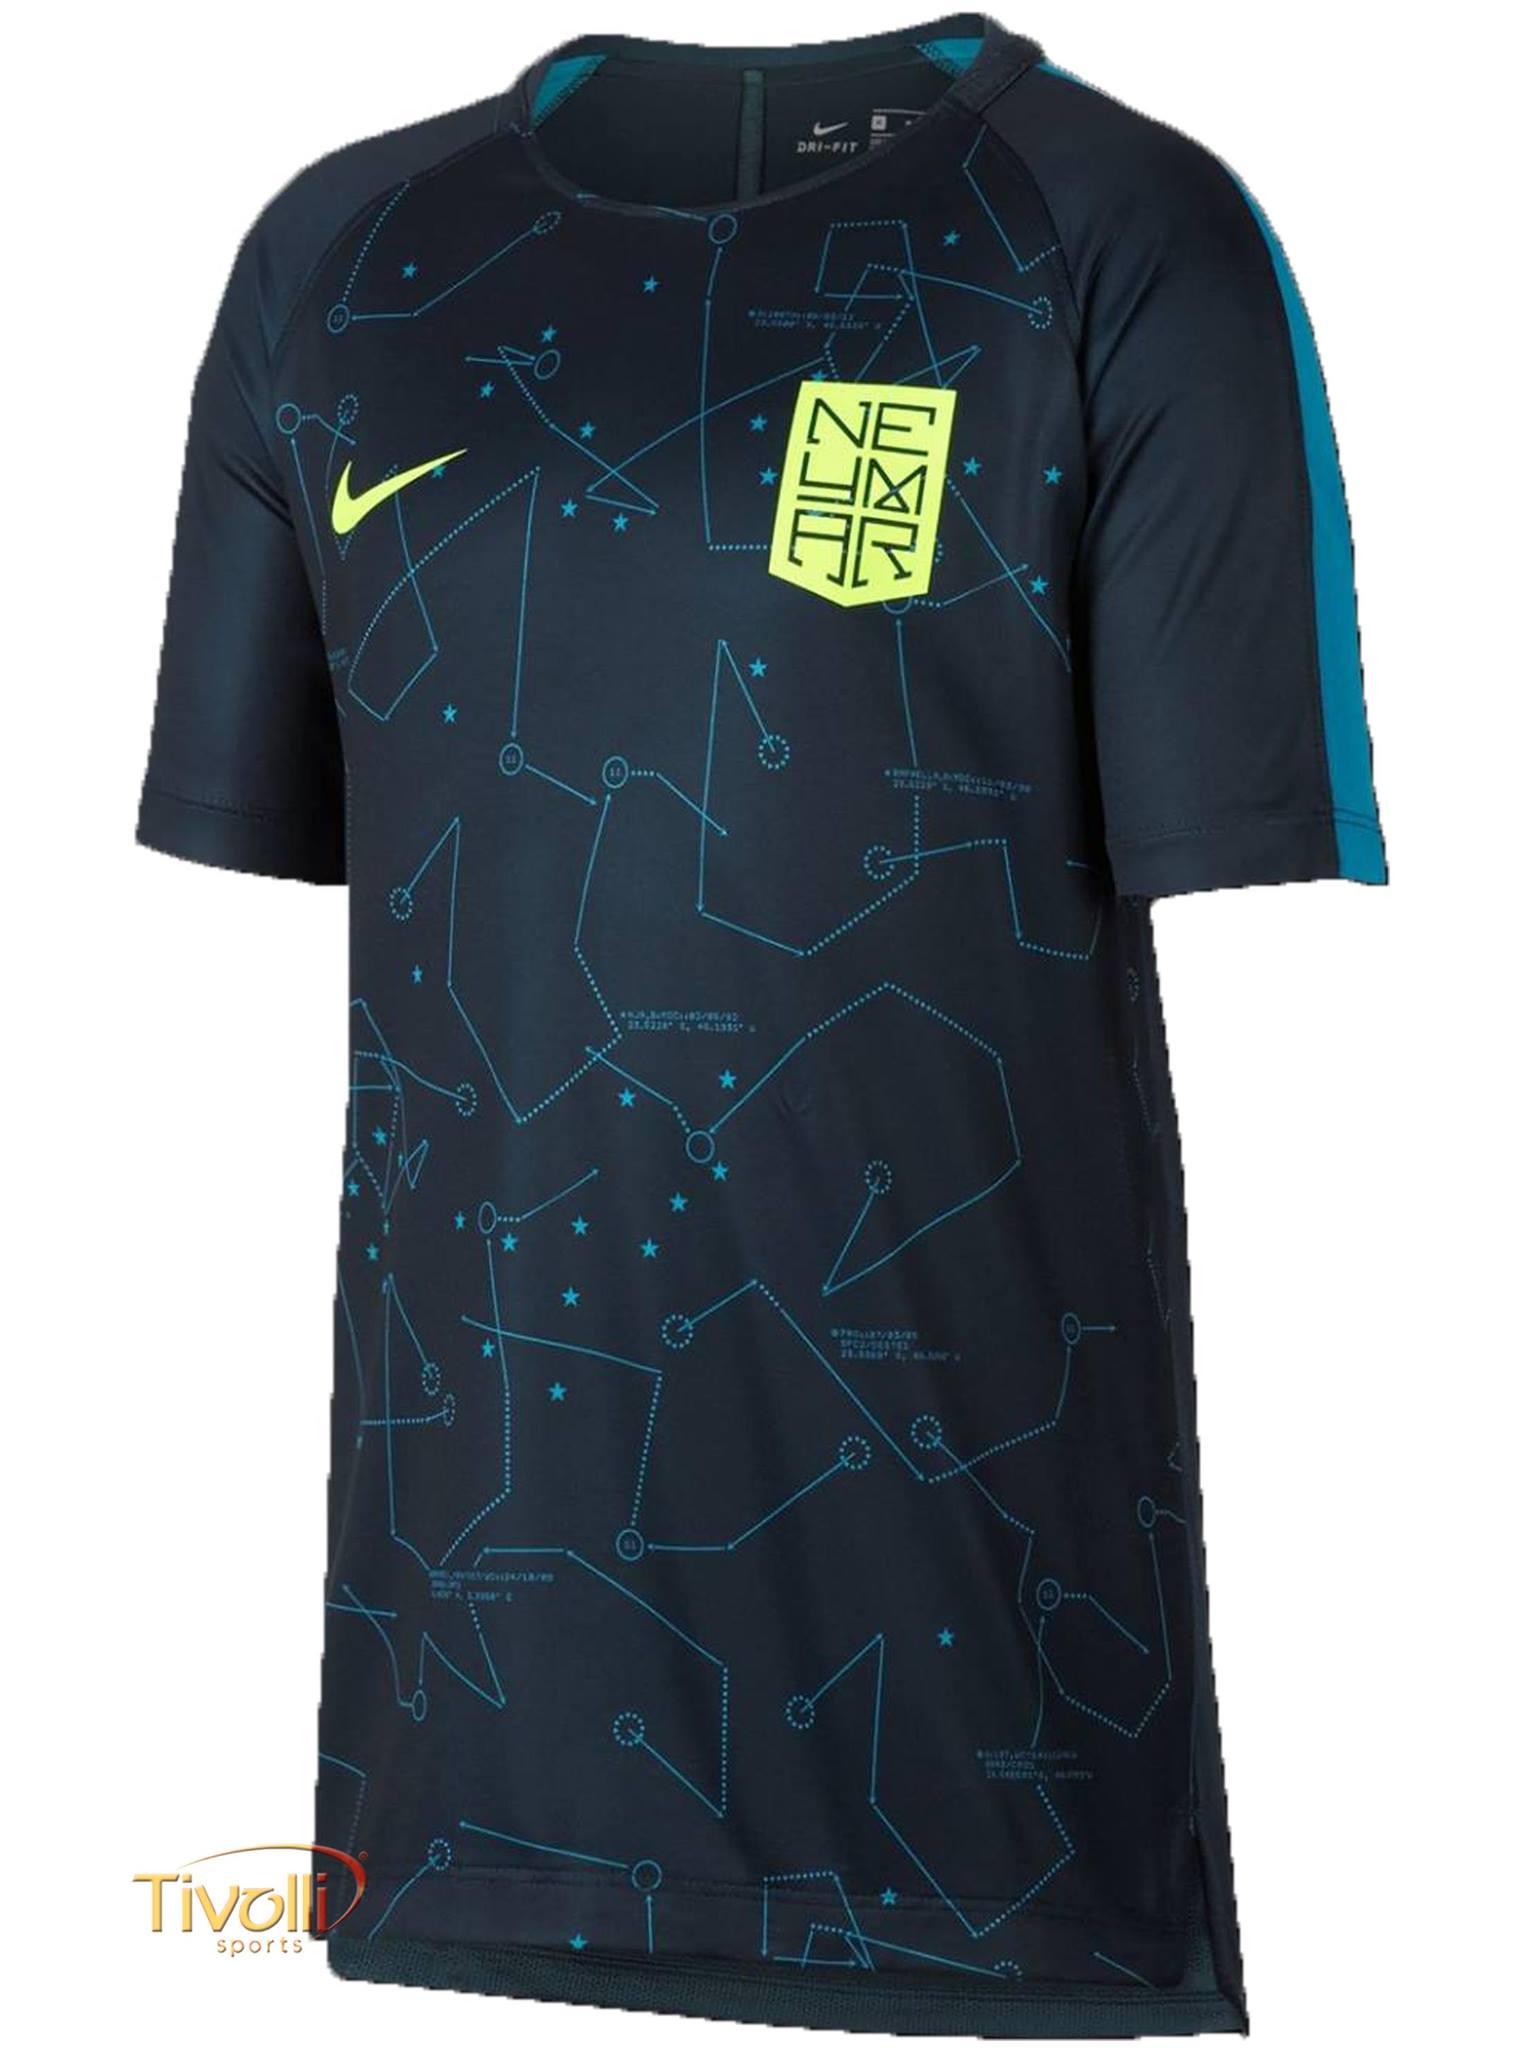 259d518b7a283 Camiseta Nike Neymar Dry Squad Top Infantil   Azul e Verde